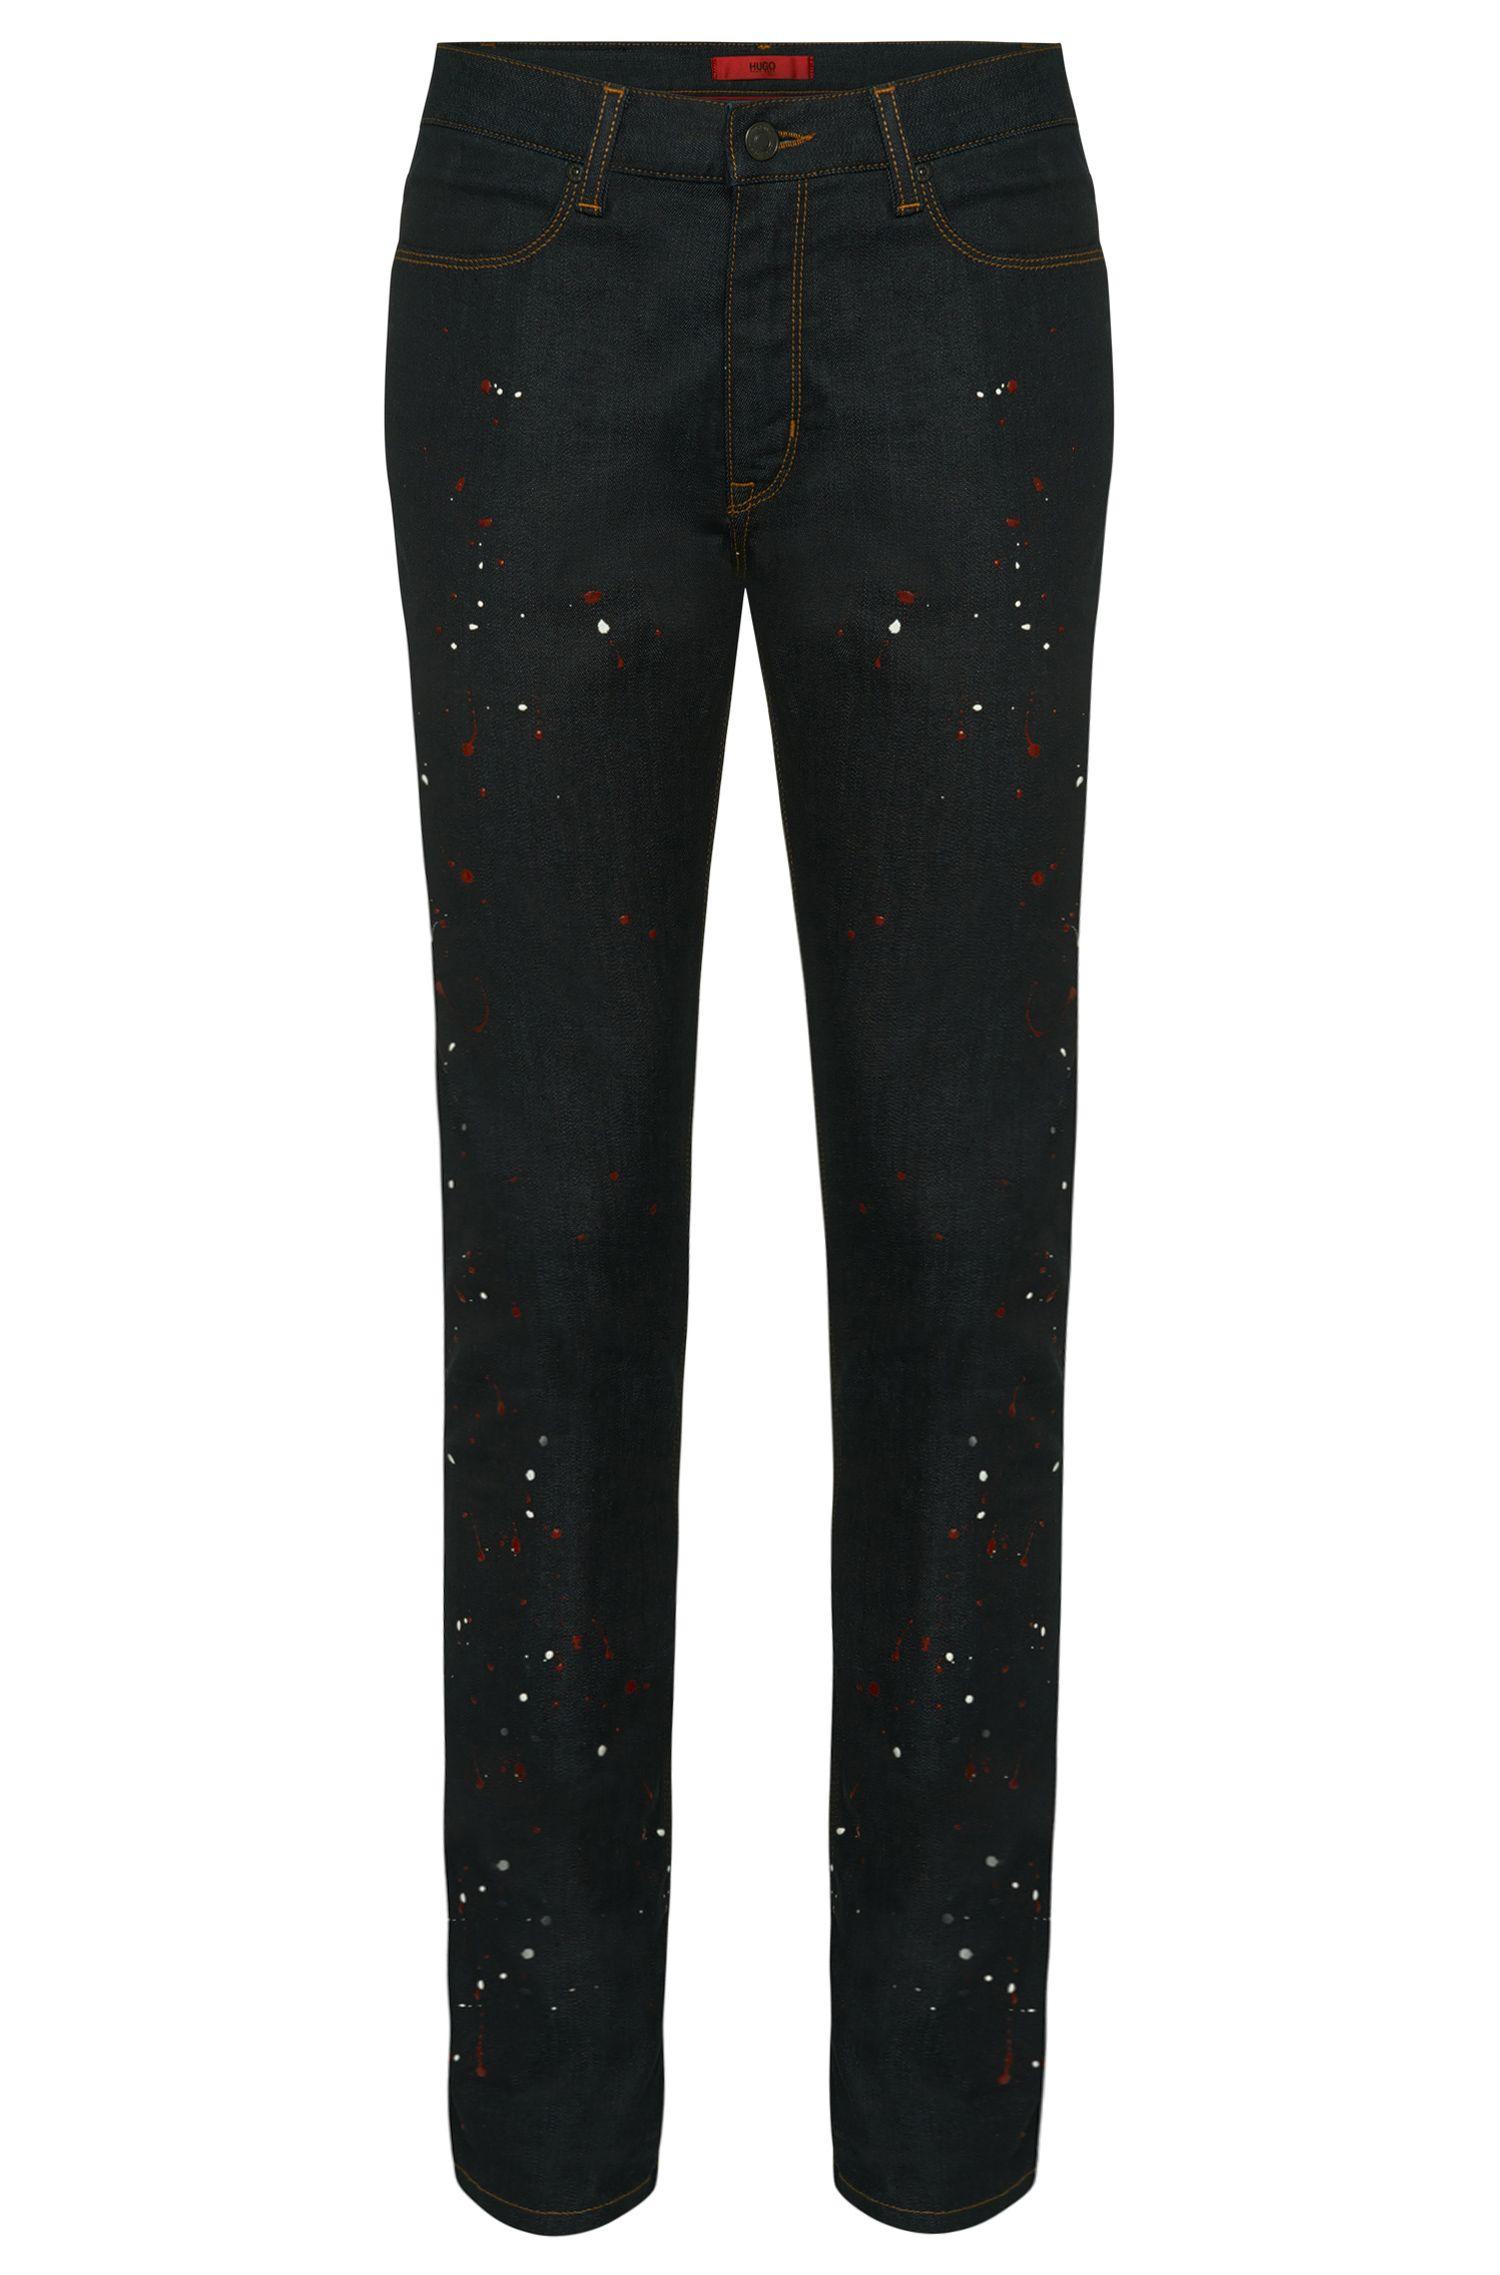 'HUGO 734' | Slim Fit, 10.5 oz Stretch Cotton Jeans